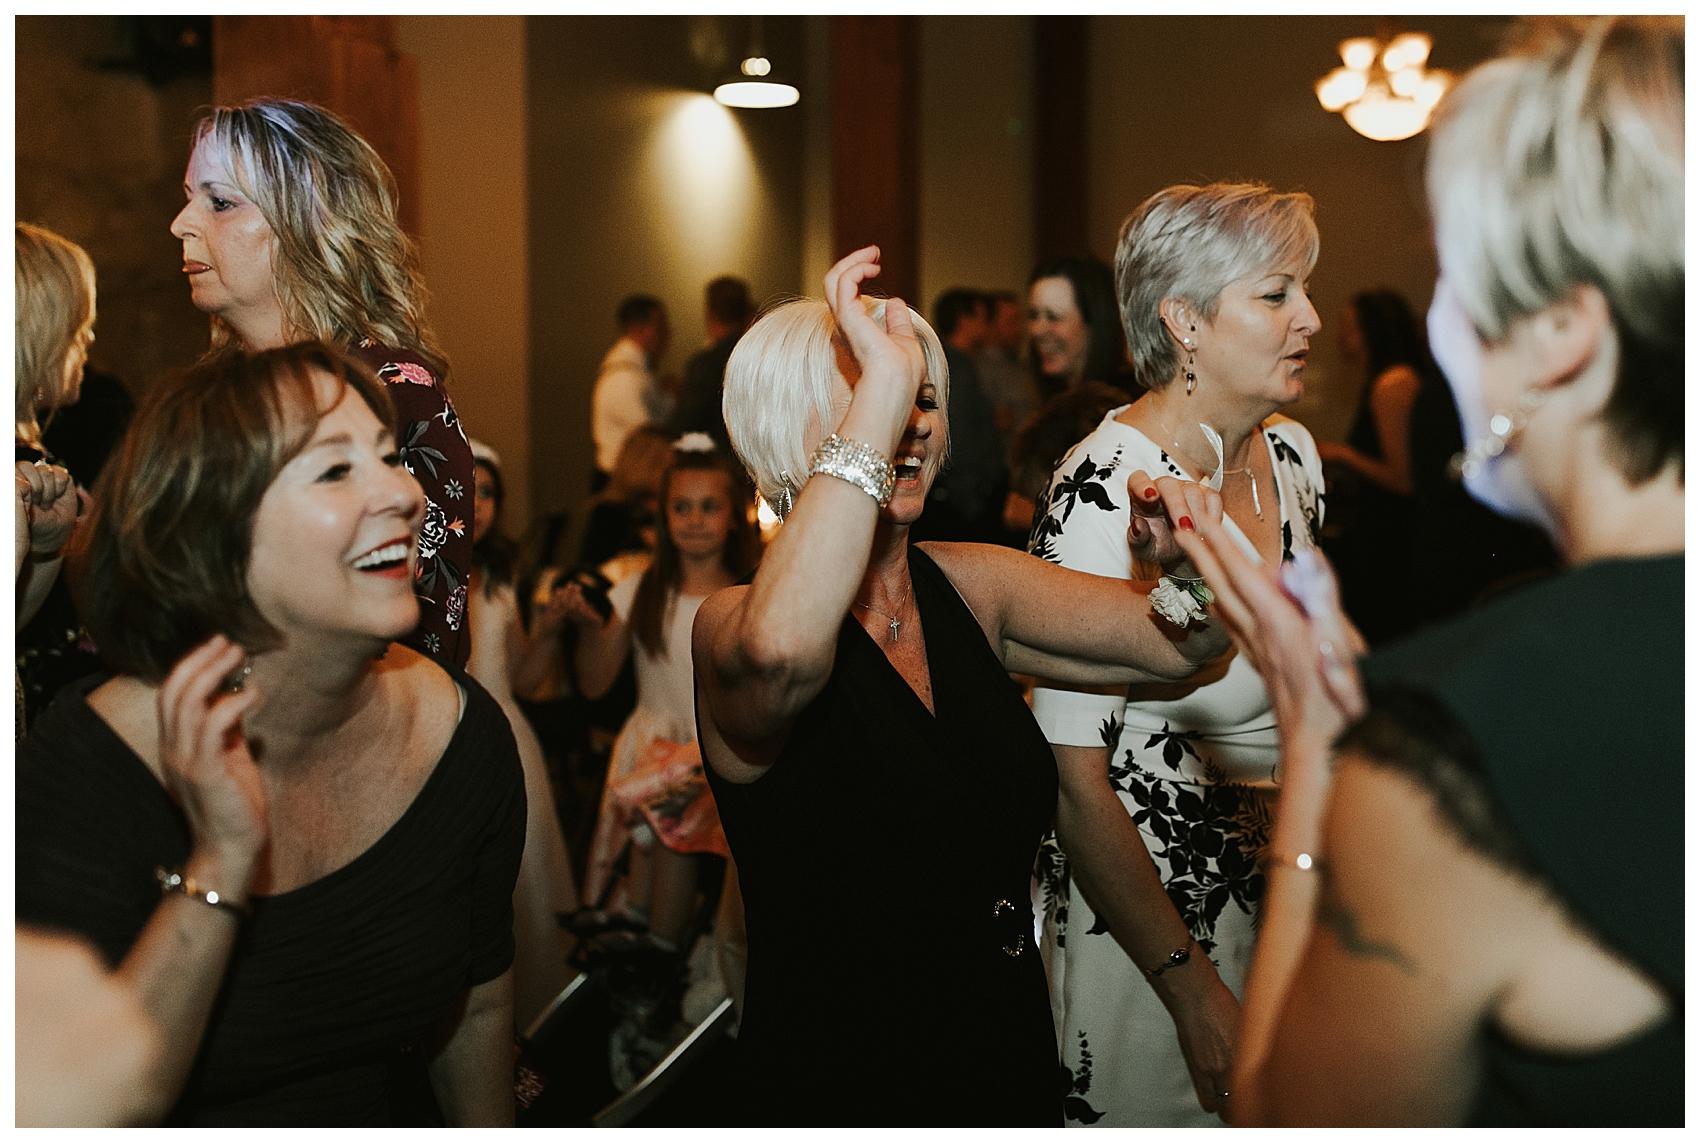 Chateau Rive Spokane Wedding Cassie Trottier Photography01123.jpg